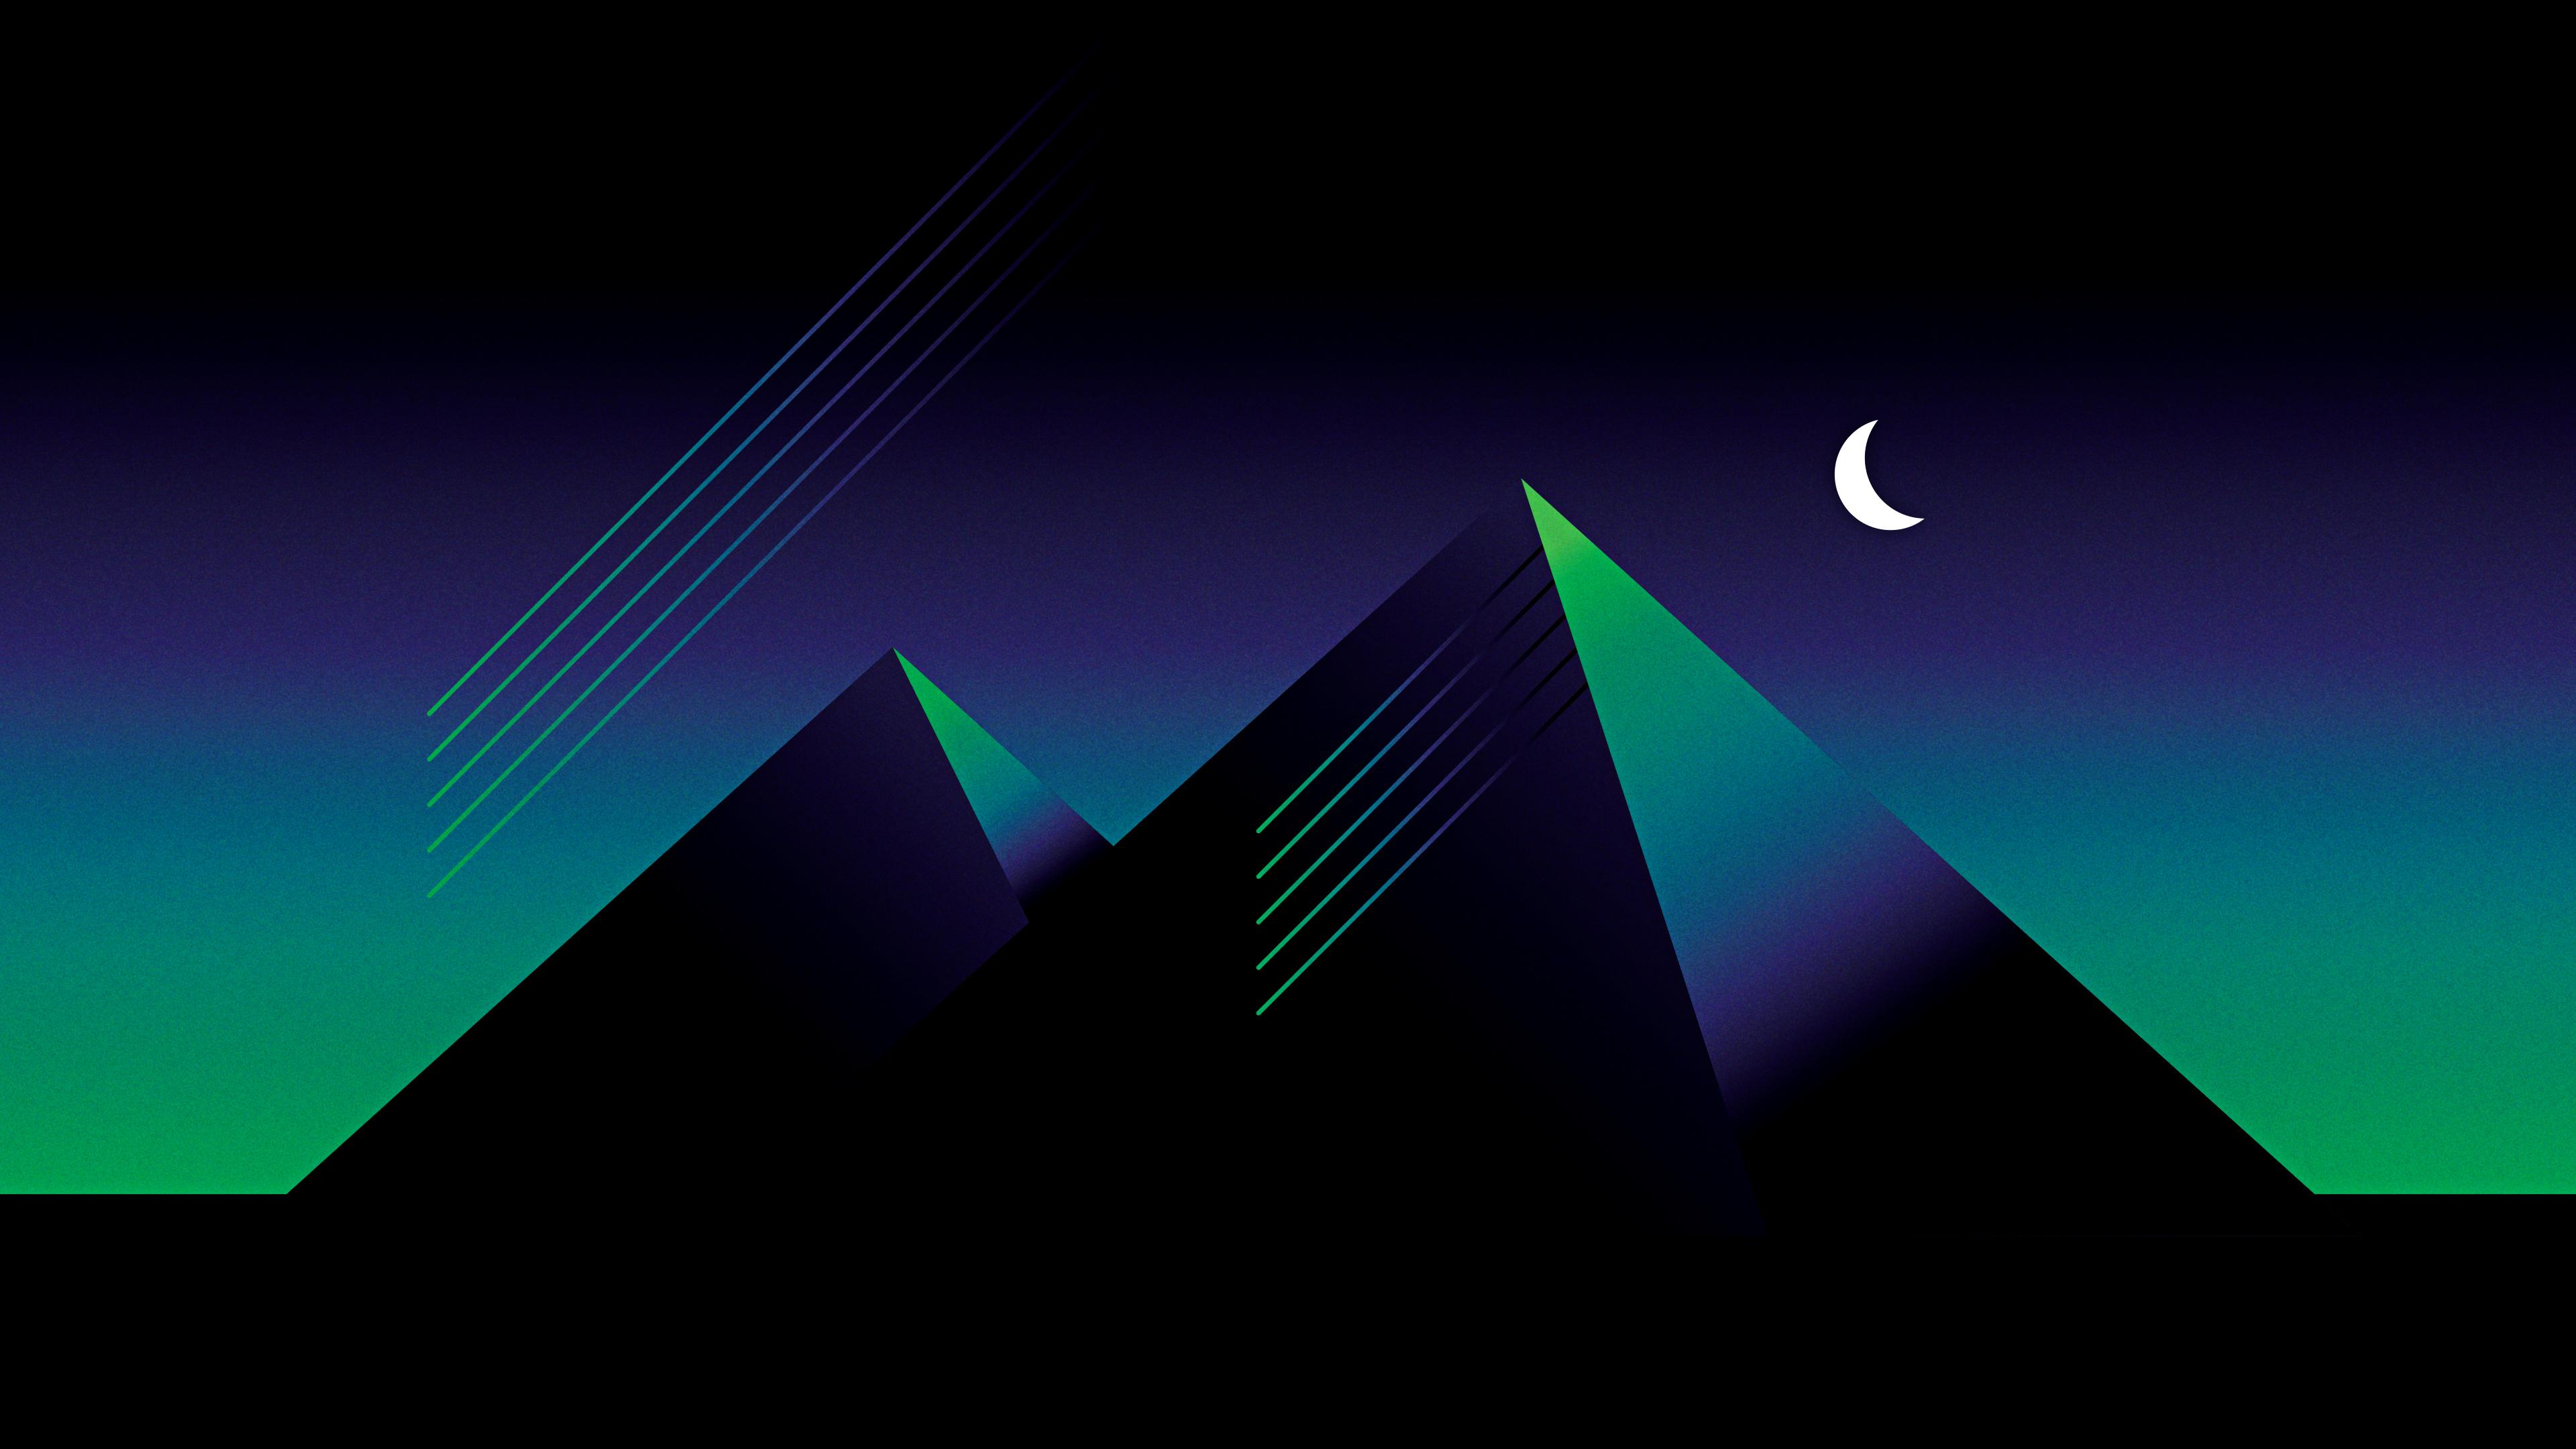 Retro Pyramid 4k Hd Artist 4k Wallpapers Images